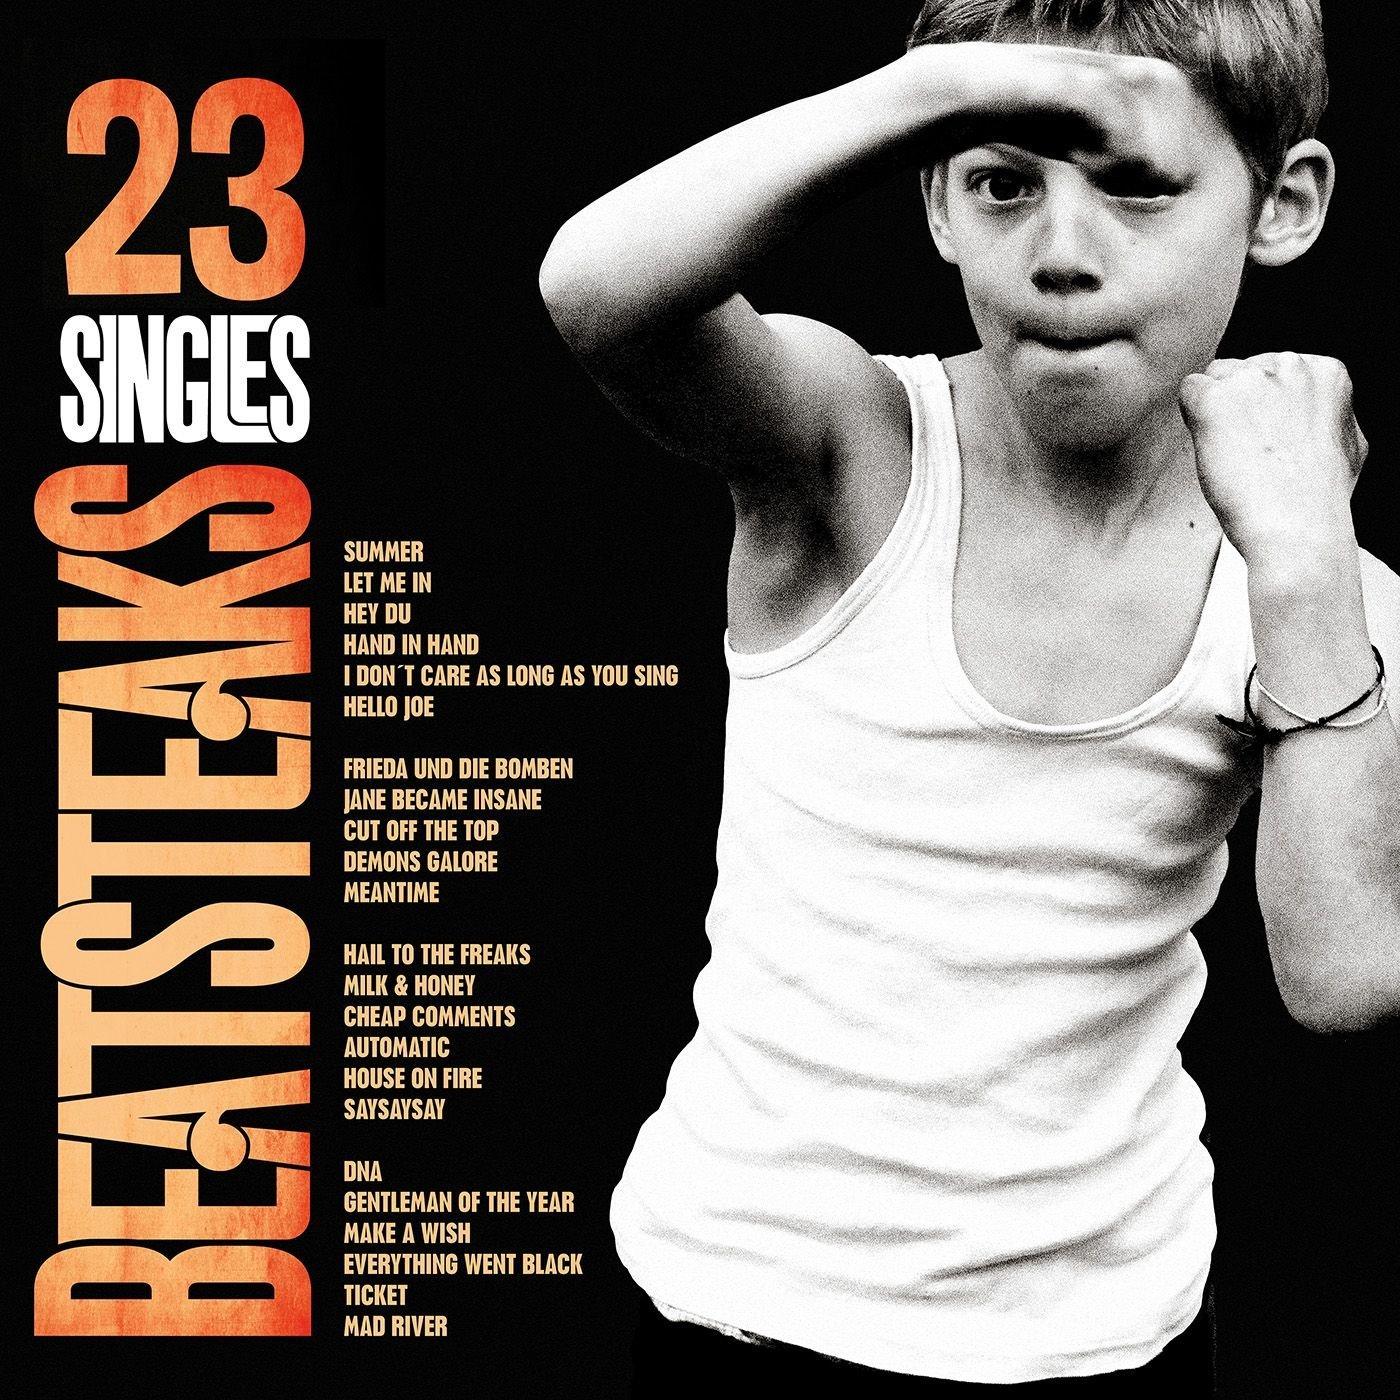 BeatsteaksВиниловые пластинки<br>Виниловая пластинка<br>